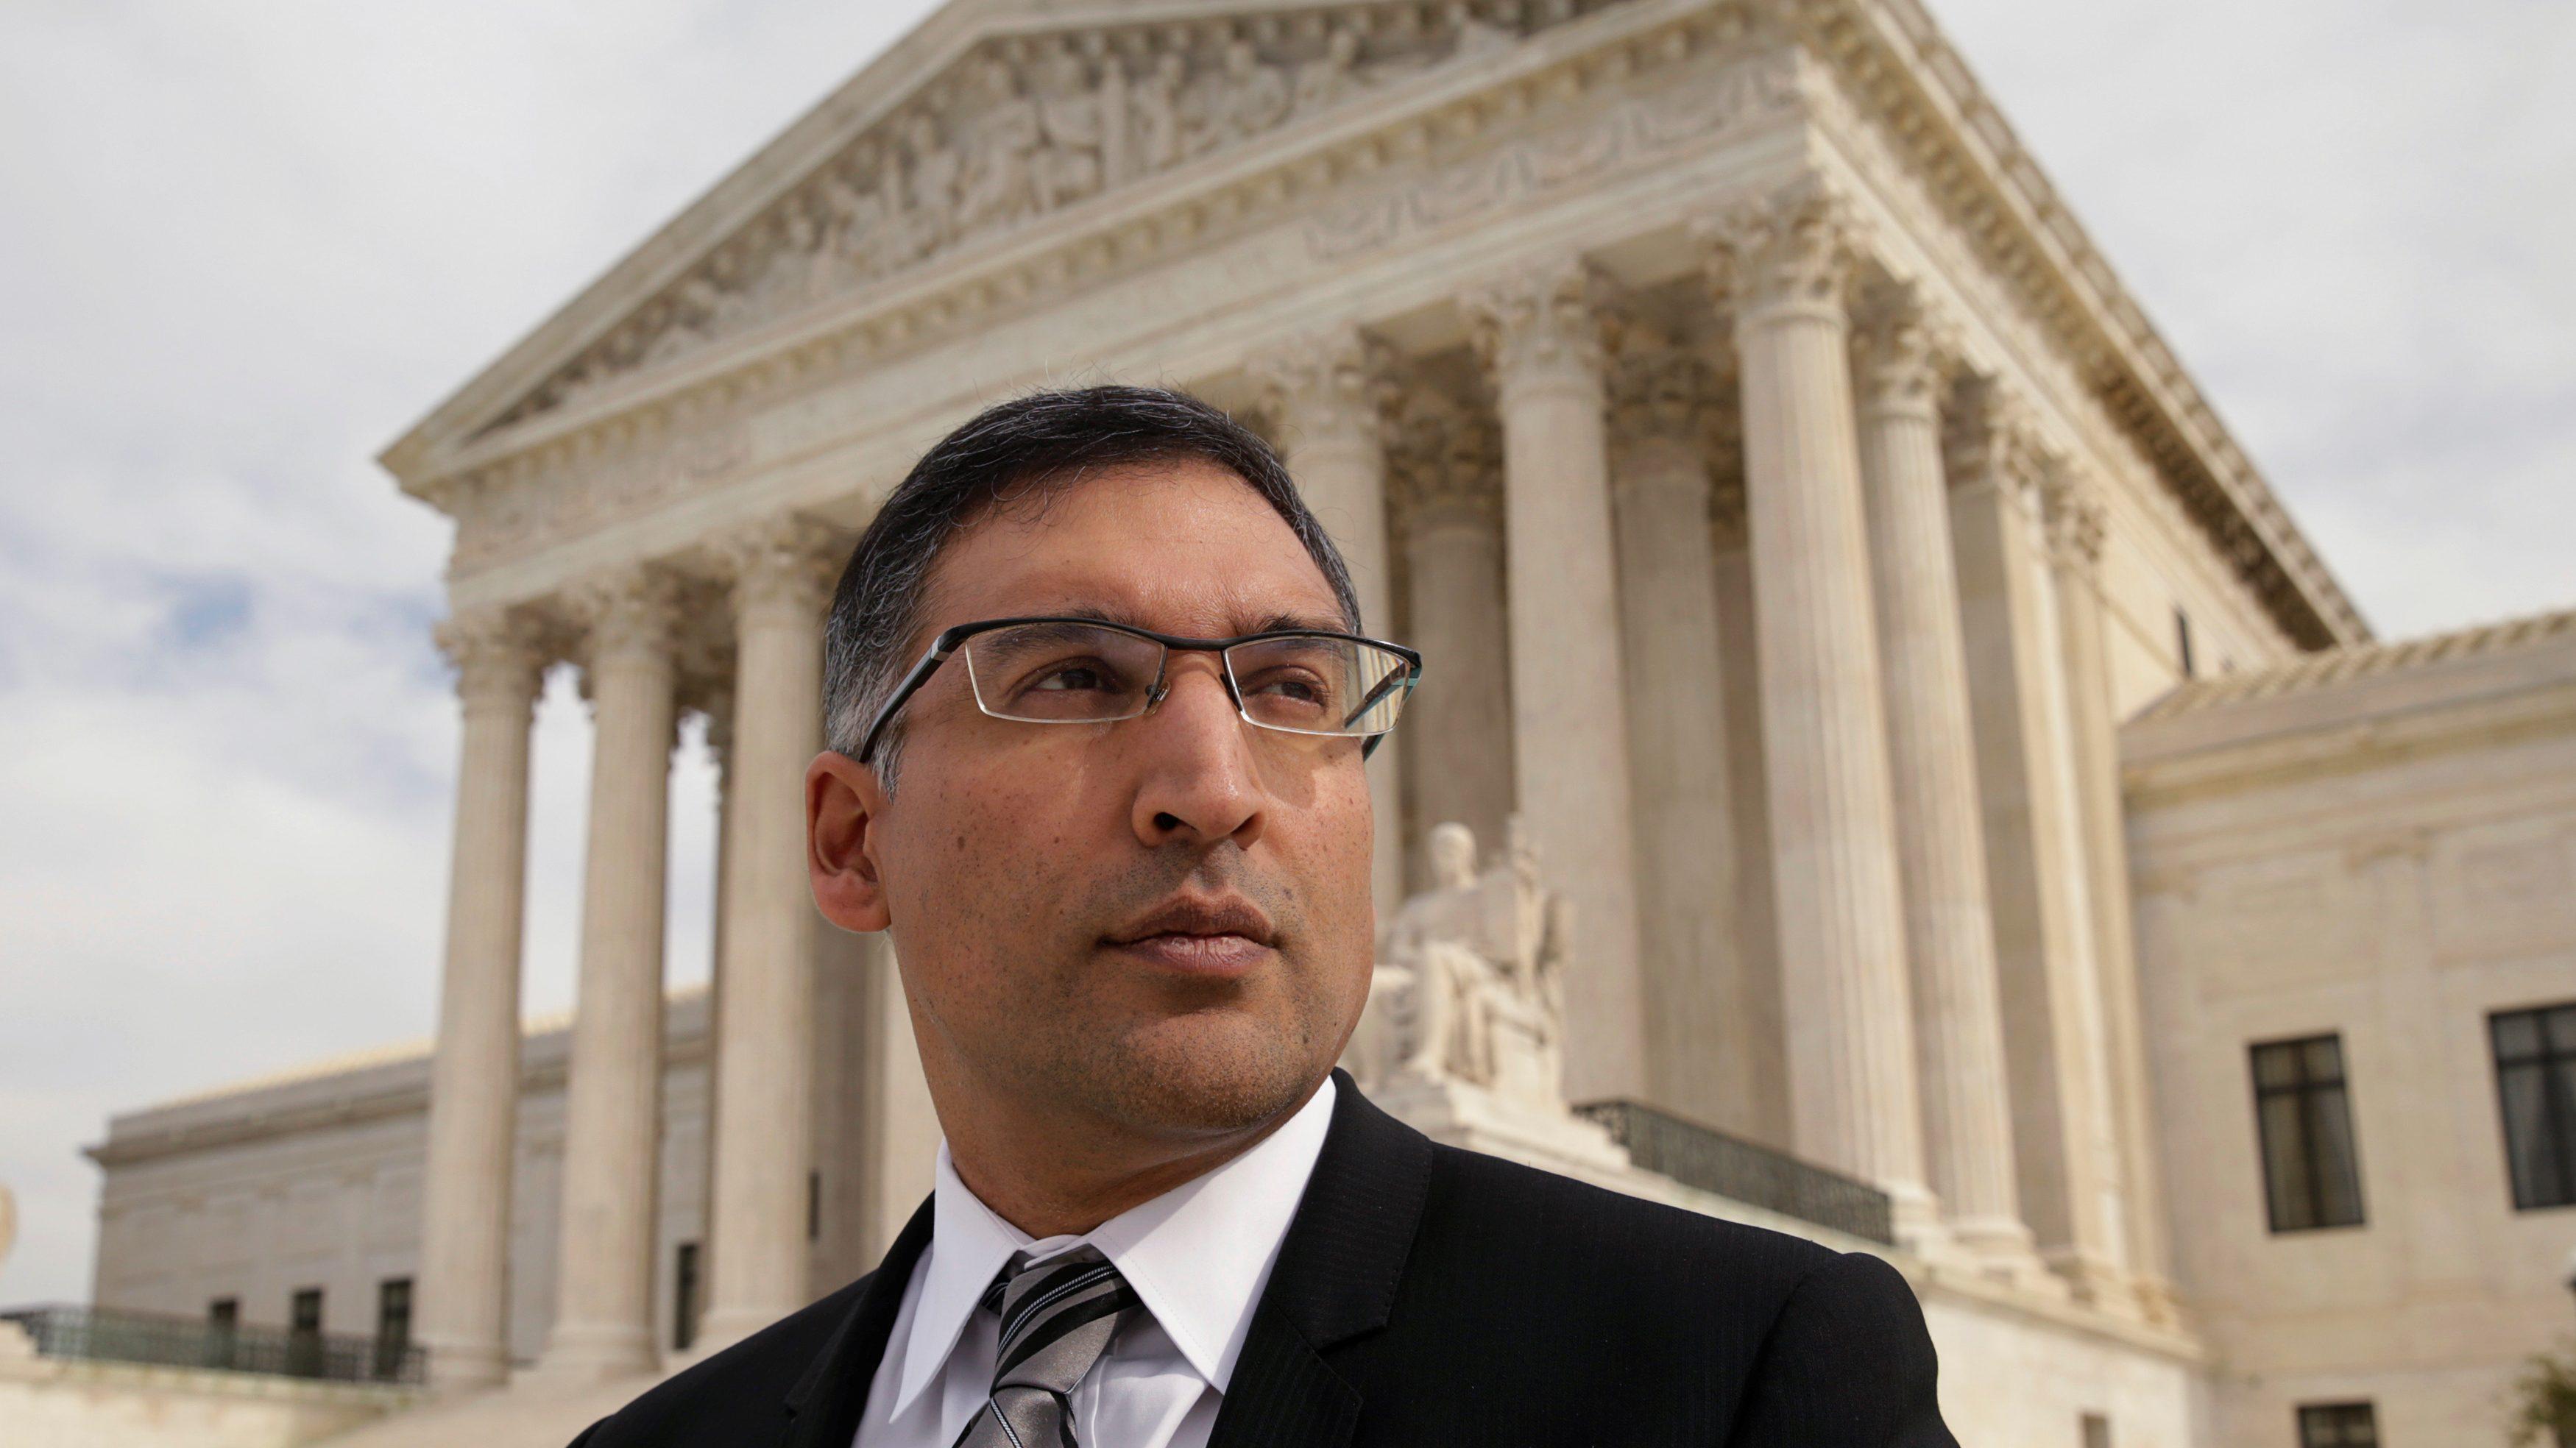 Attorney Neal Katyal